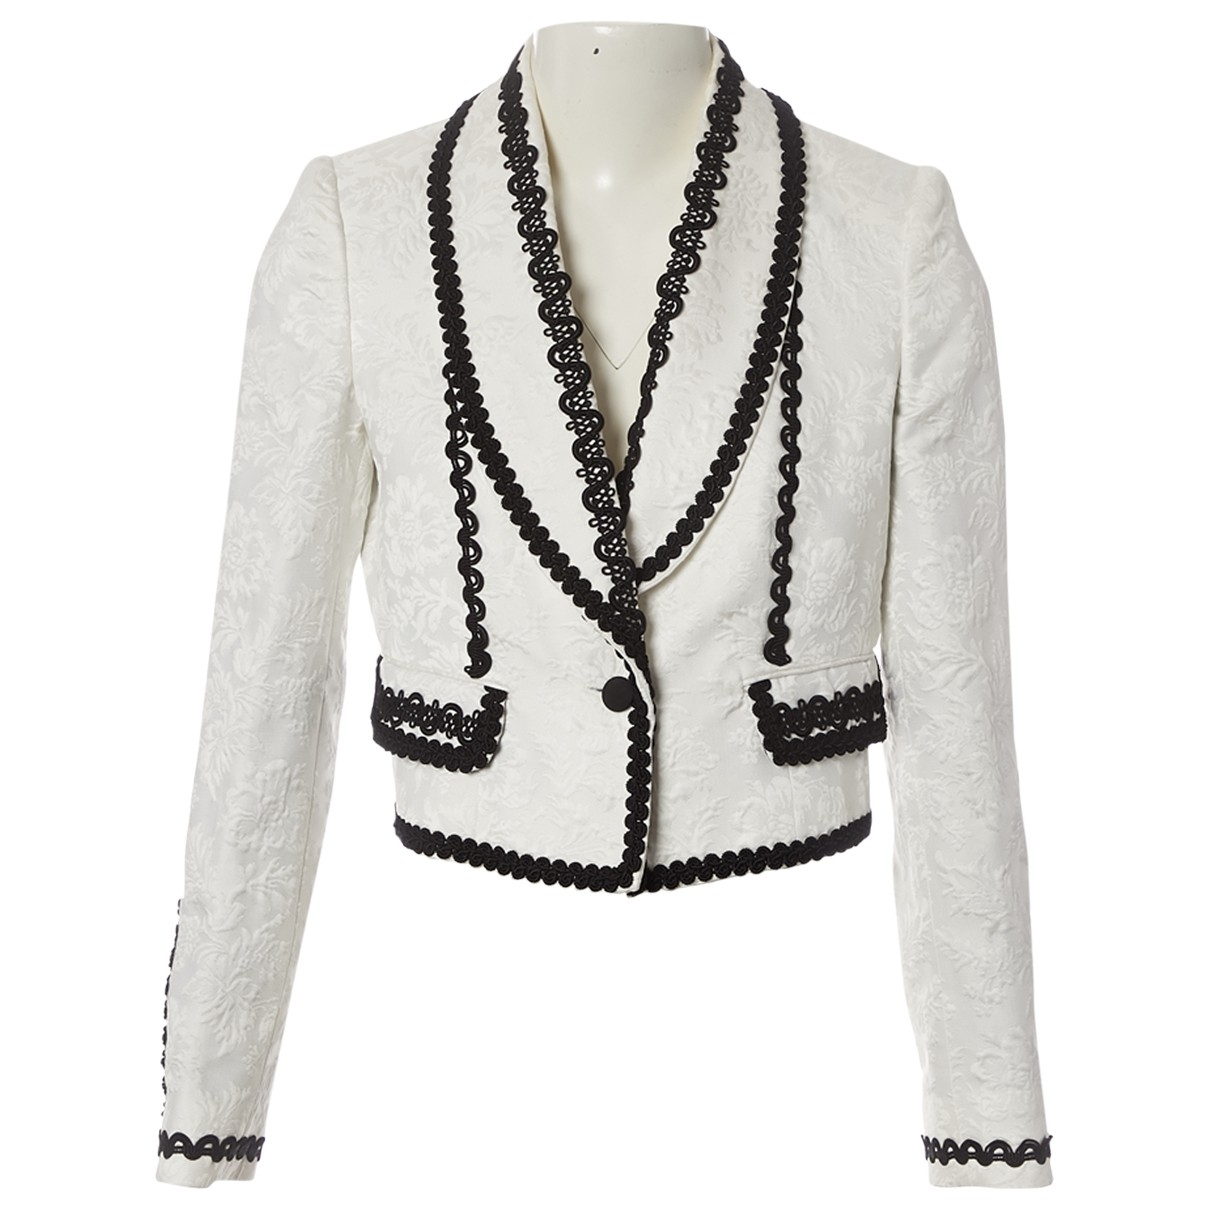 Dolce & Gabbana \N White Cotton jacket for Women 42 IT